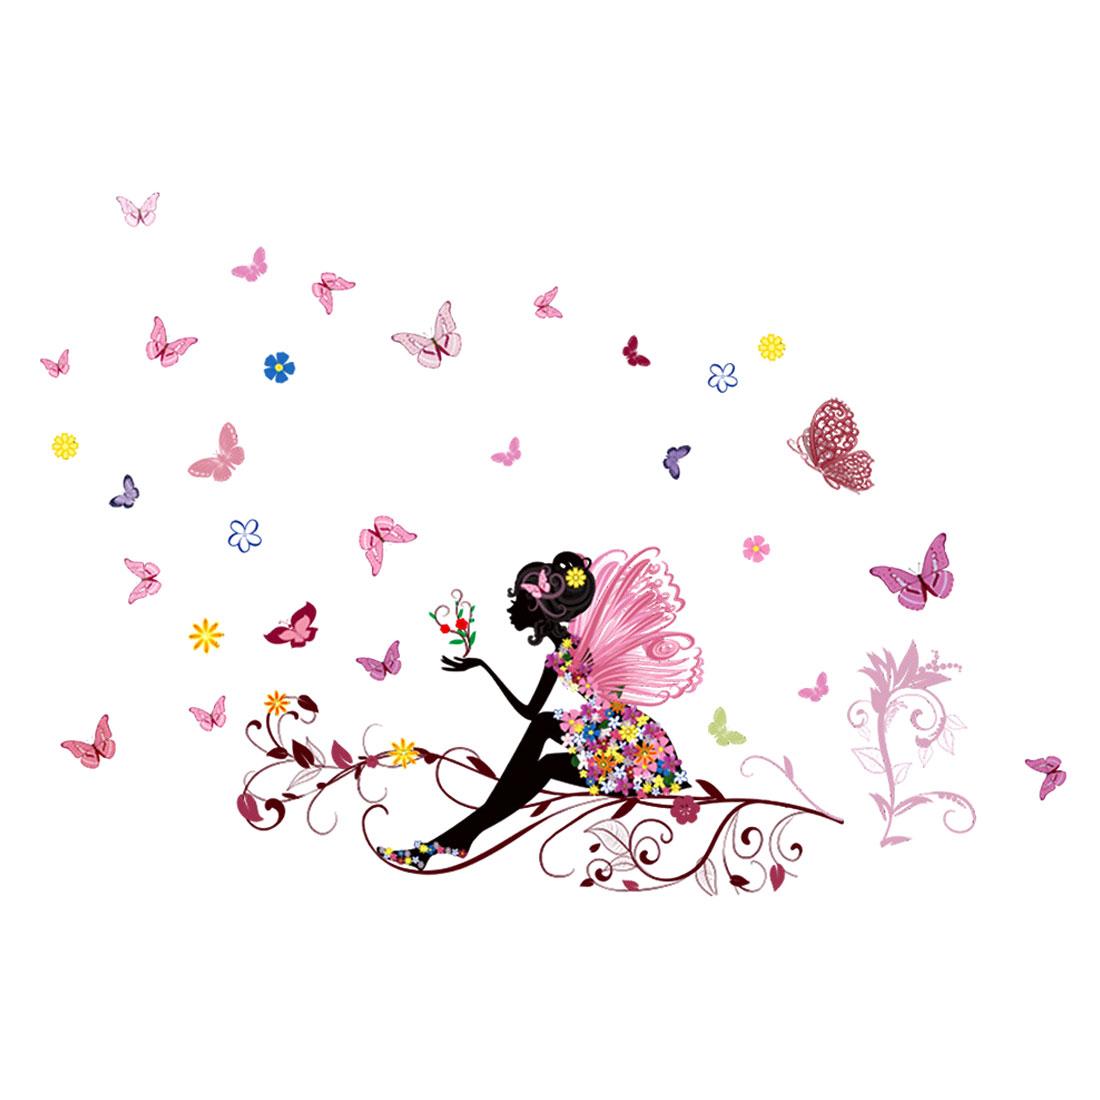 Butterfly Flower Girl Pattern Mural Wall Sticker Removable Art Vinyl Decal DIY